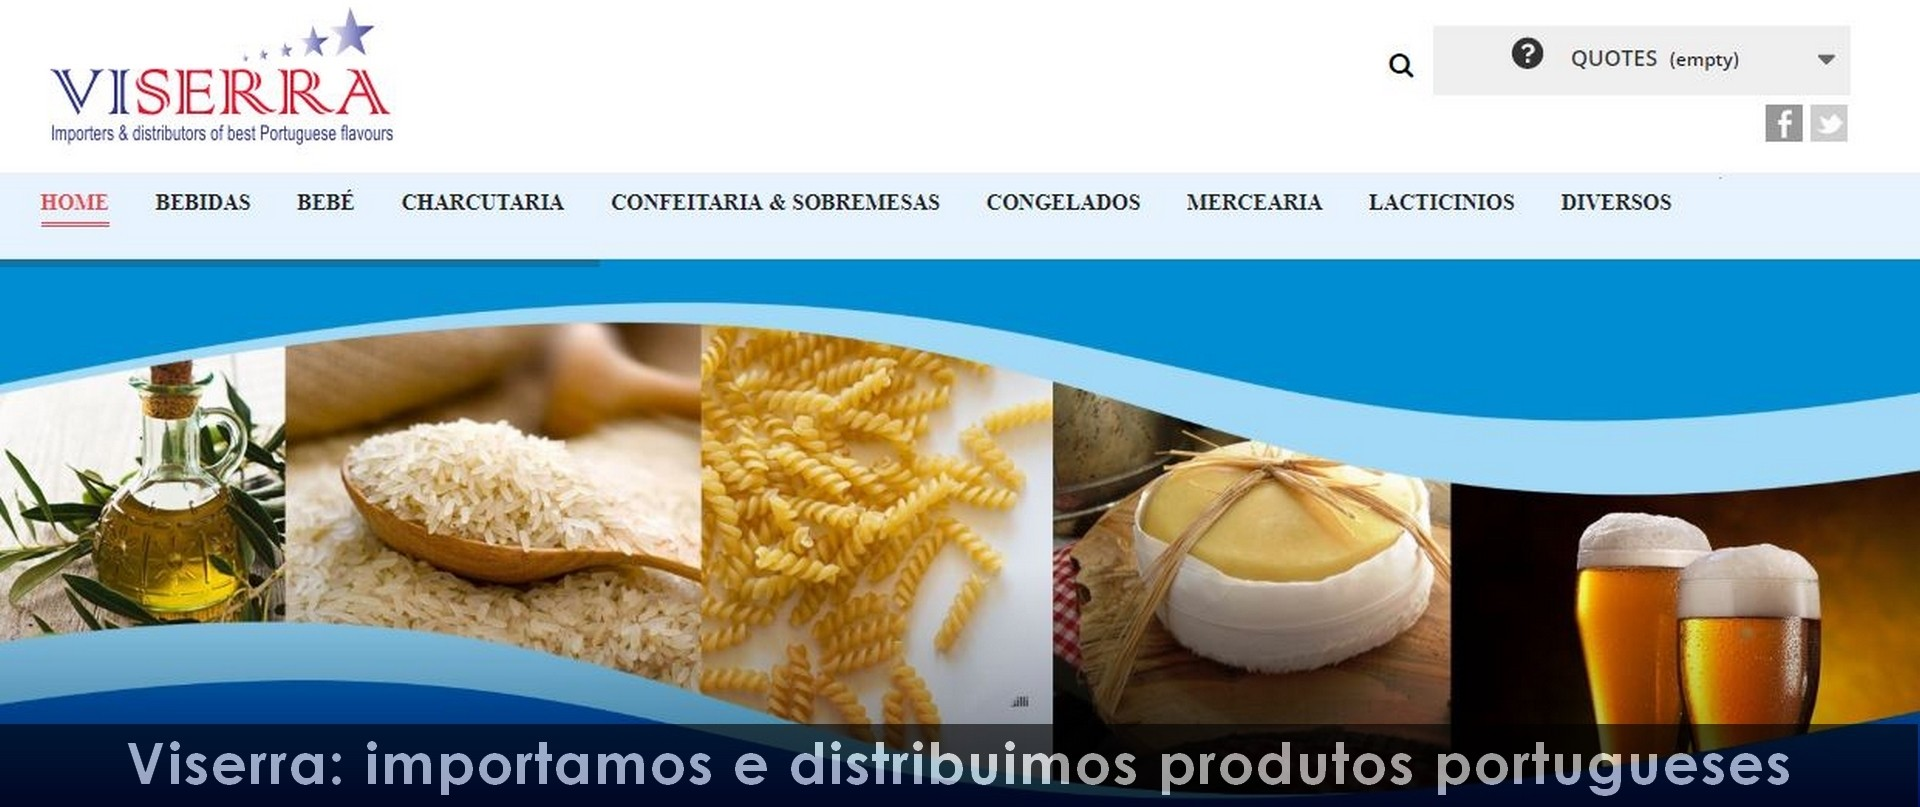 http://www.cantinhodamadeira.pt/cache/resized/1876d750cc42f124579b9ff7e184ca53.jpg